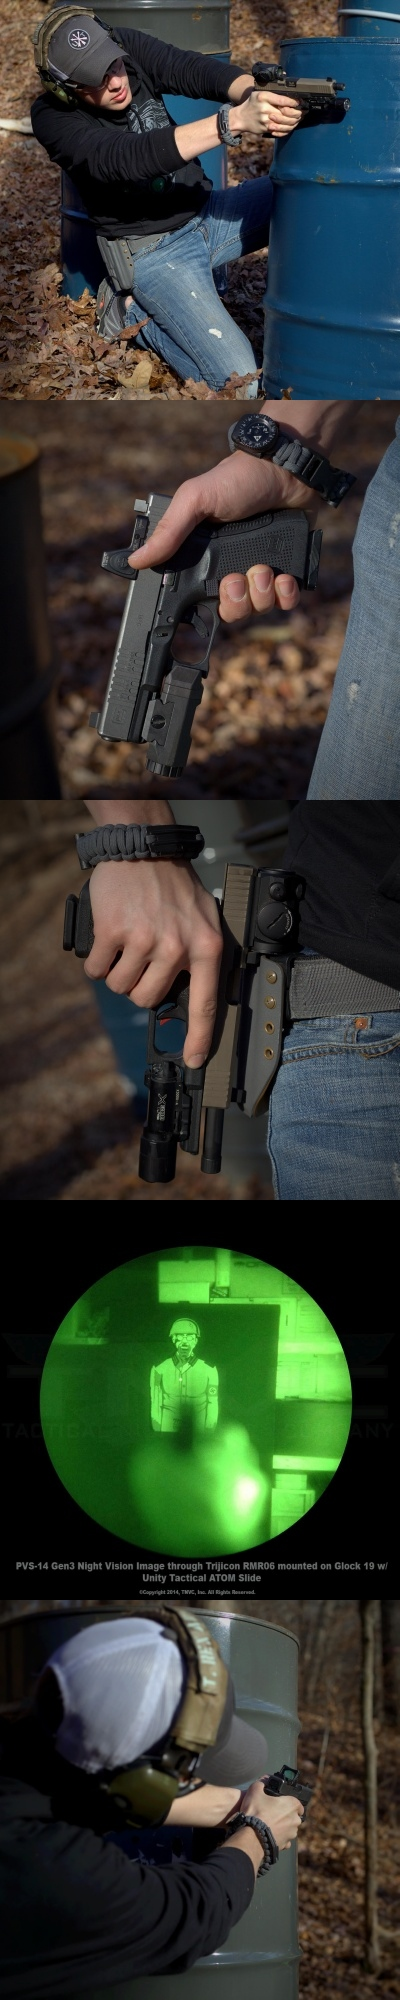 Reddots_on_Pistols_Spread